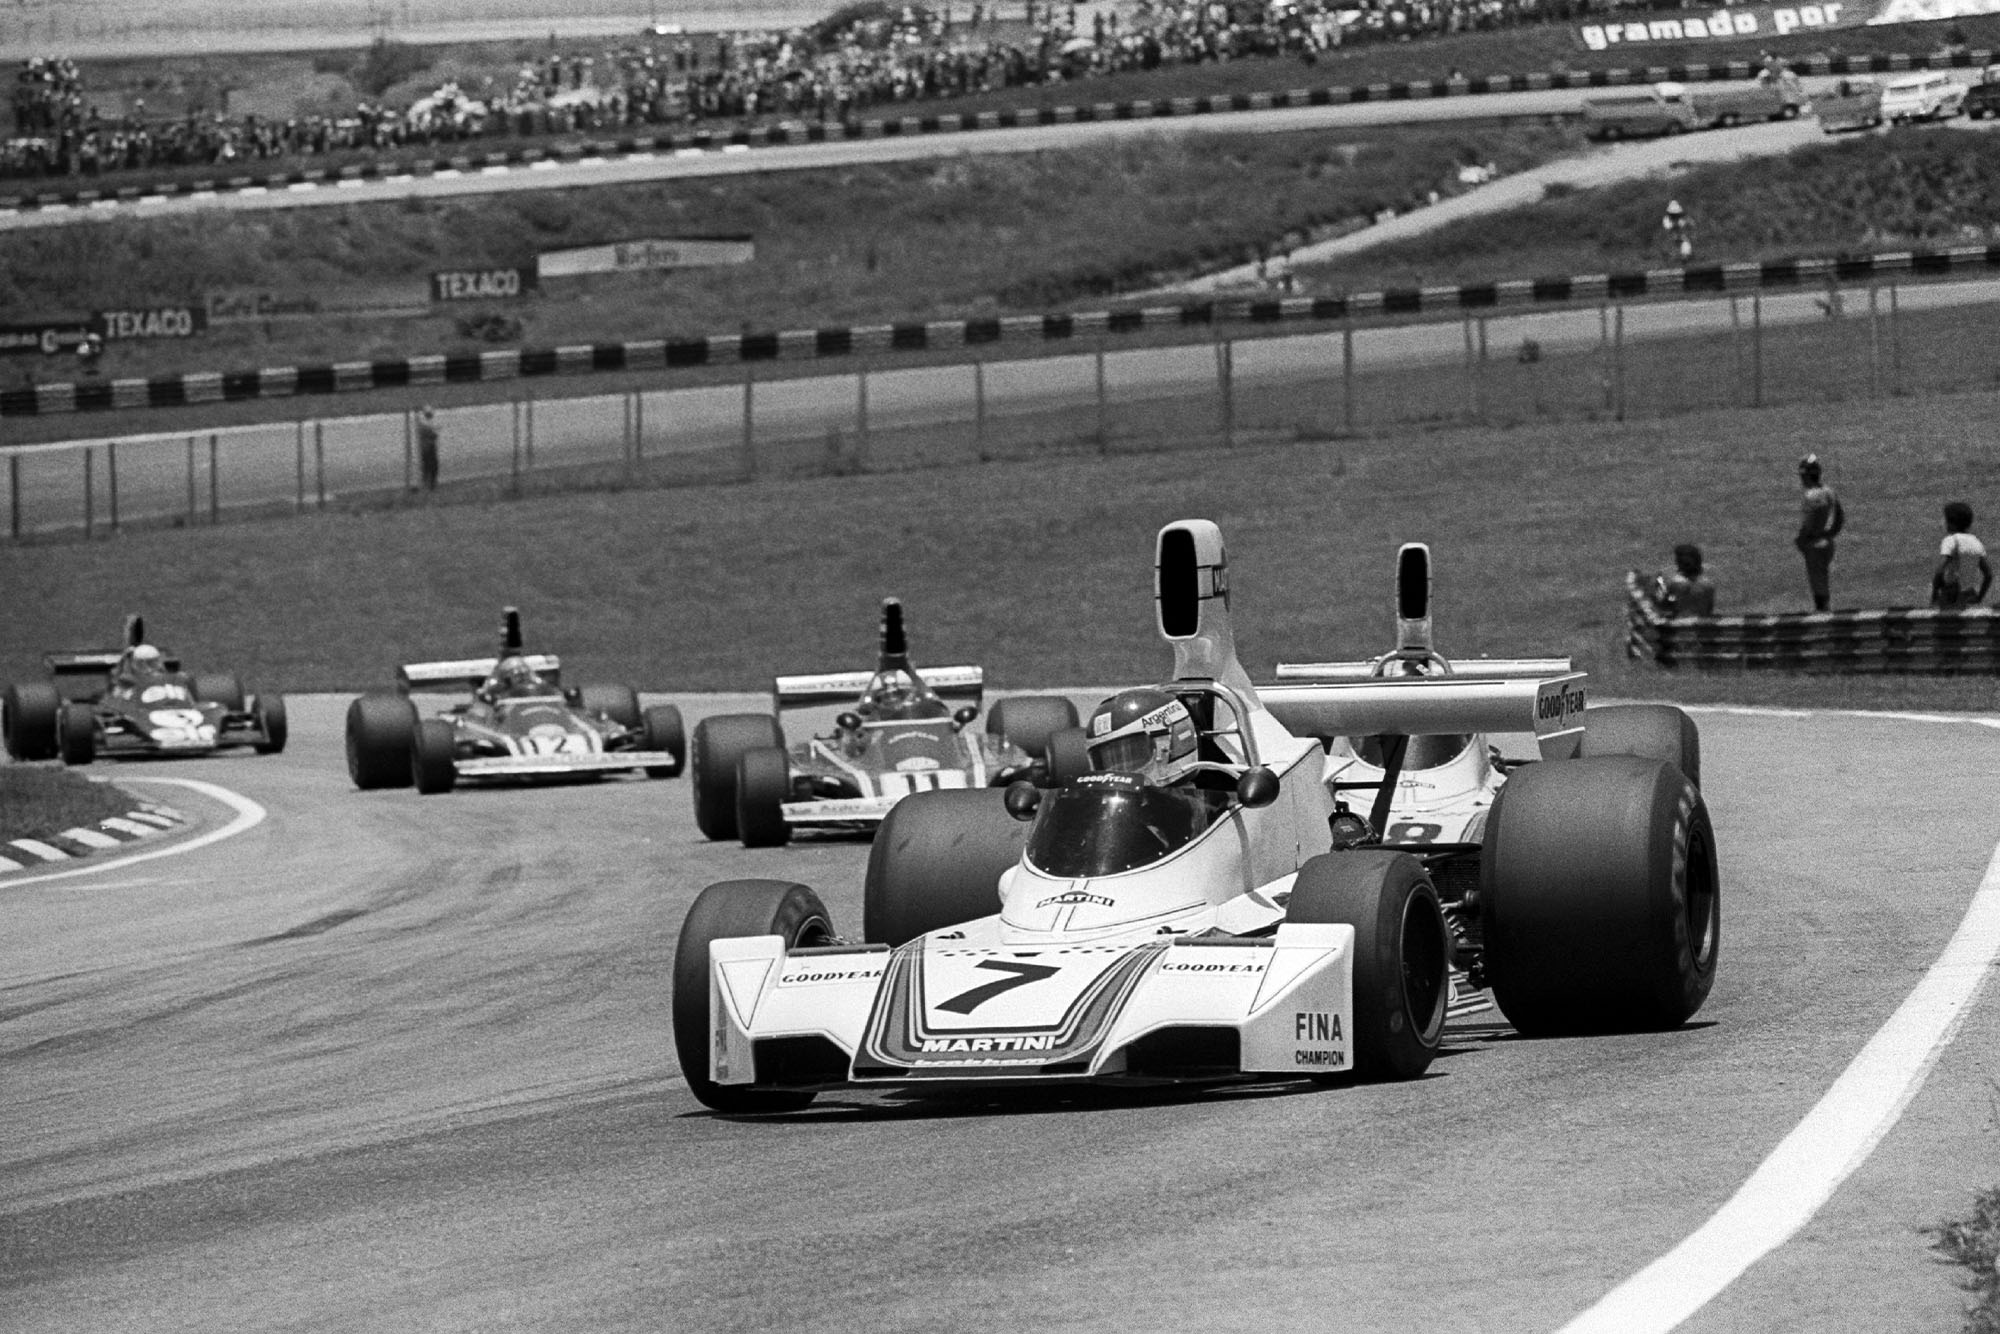 Brabham's Carlos Pace driving at the 1975 Brazilian Grand Prix, Interlagos.